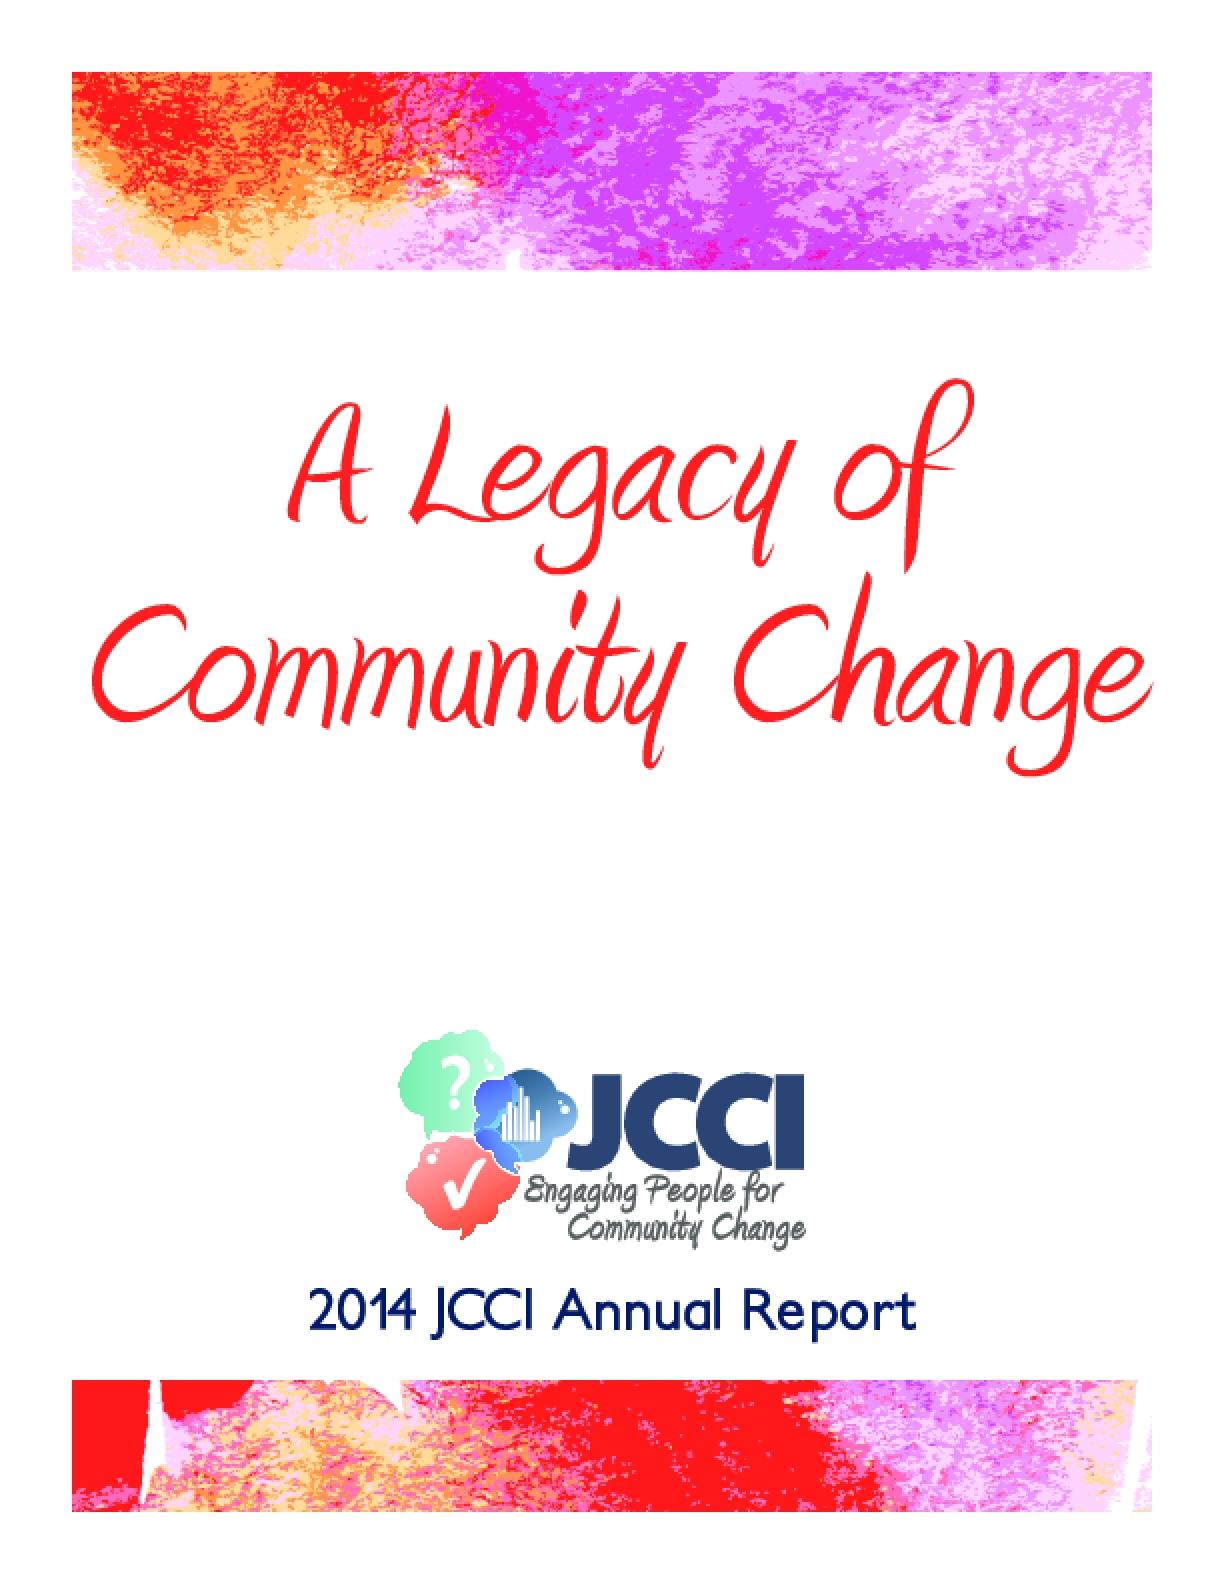 A Legacy of Community Change